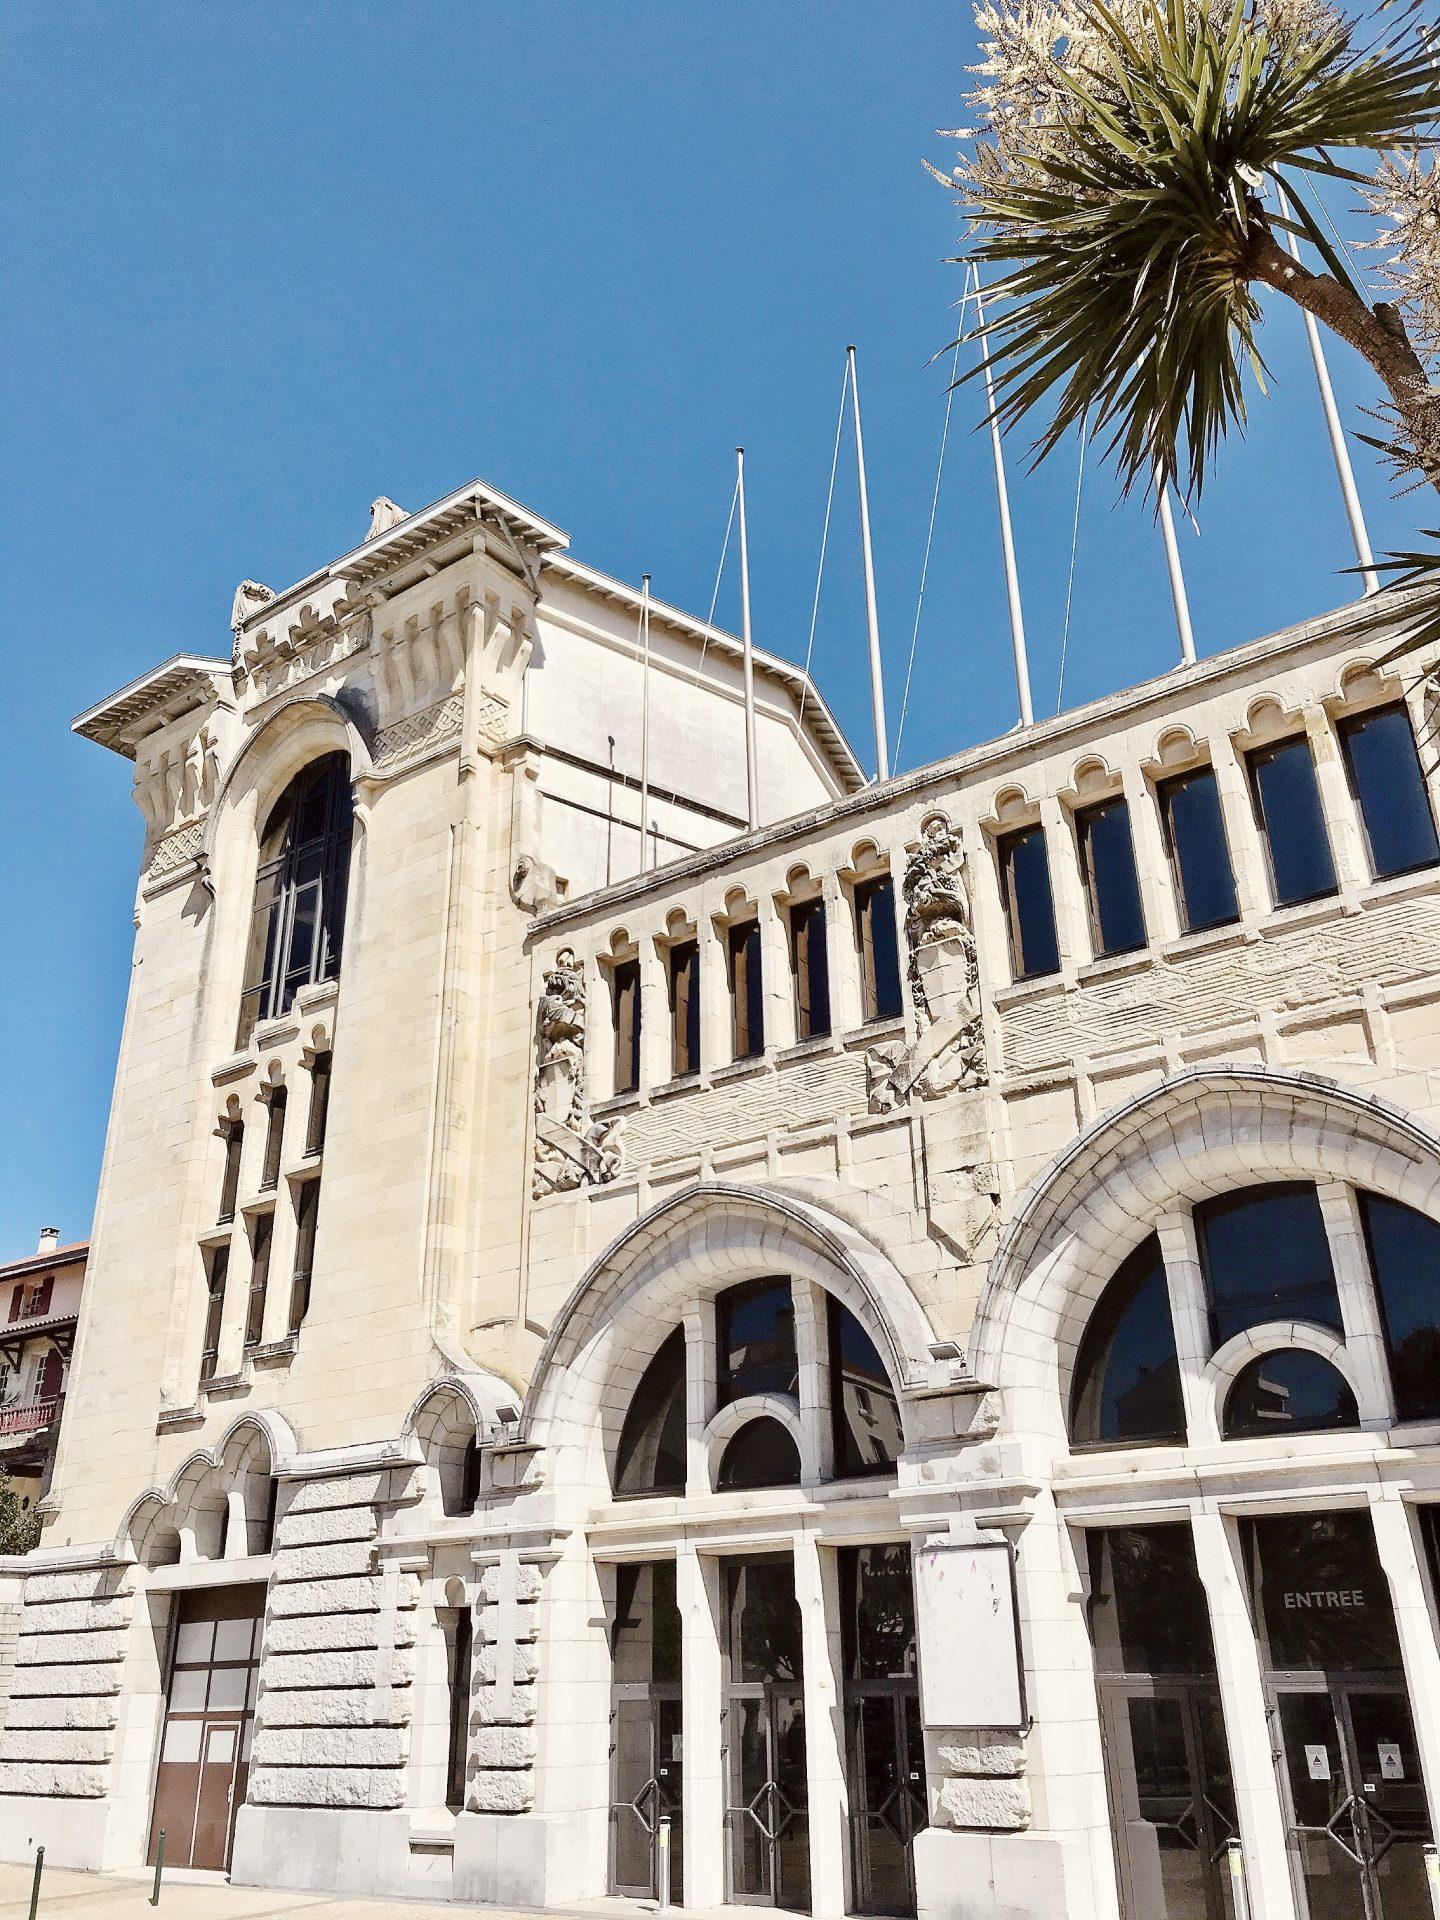 balade historique à Biarritz